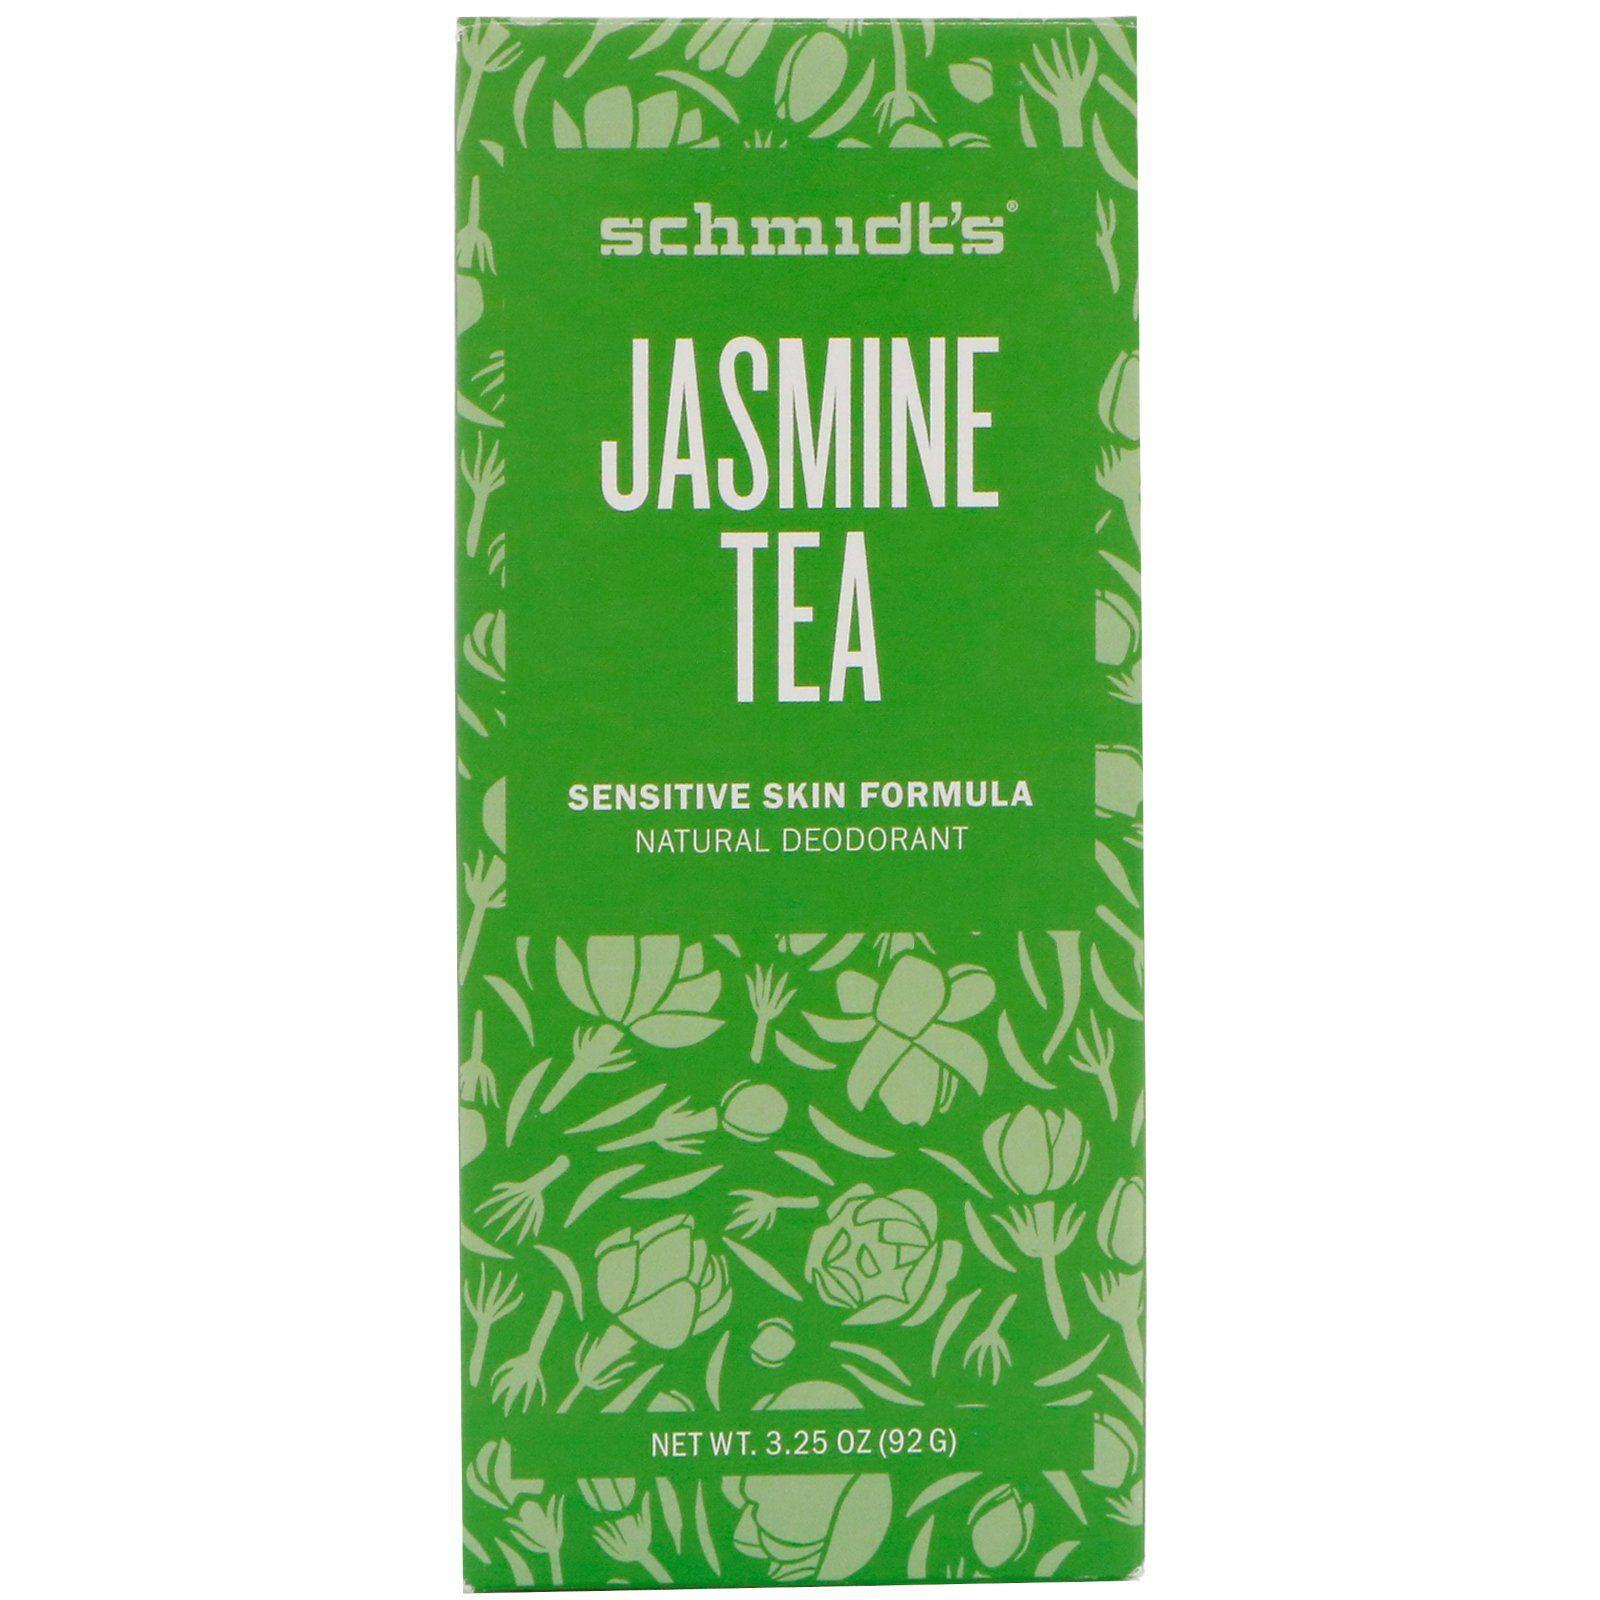 Schmidt S Naturals Natural Deodorant Sensitive Skin Formula Jasmine Tea 3 25 Oz 92 G Zhasminovyj Chaj Tovary Dlya Zdorovya Chaj